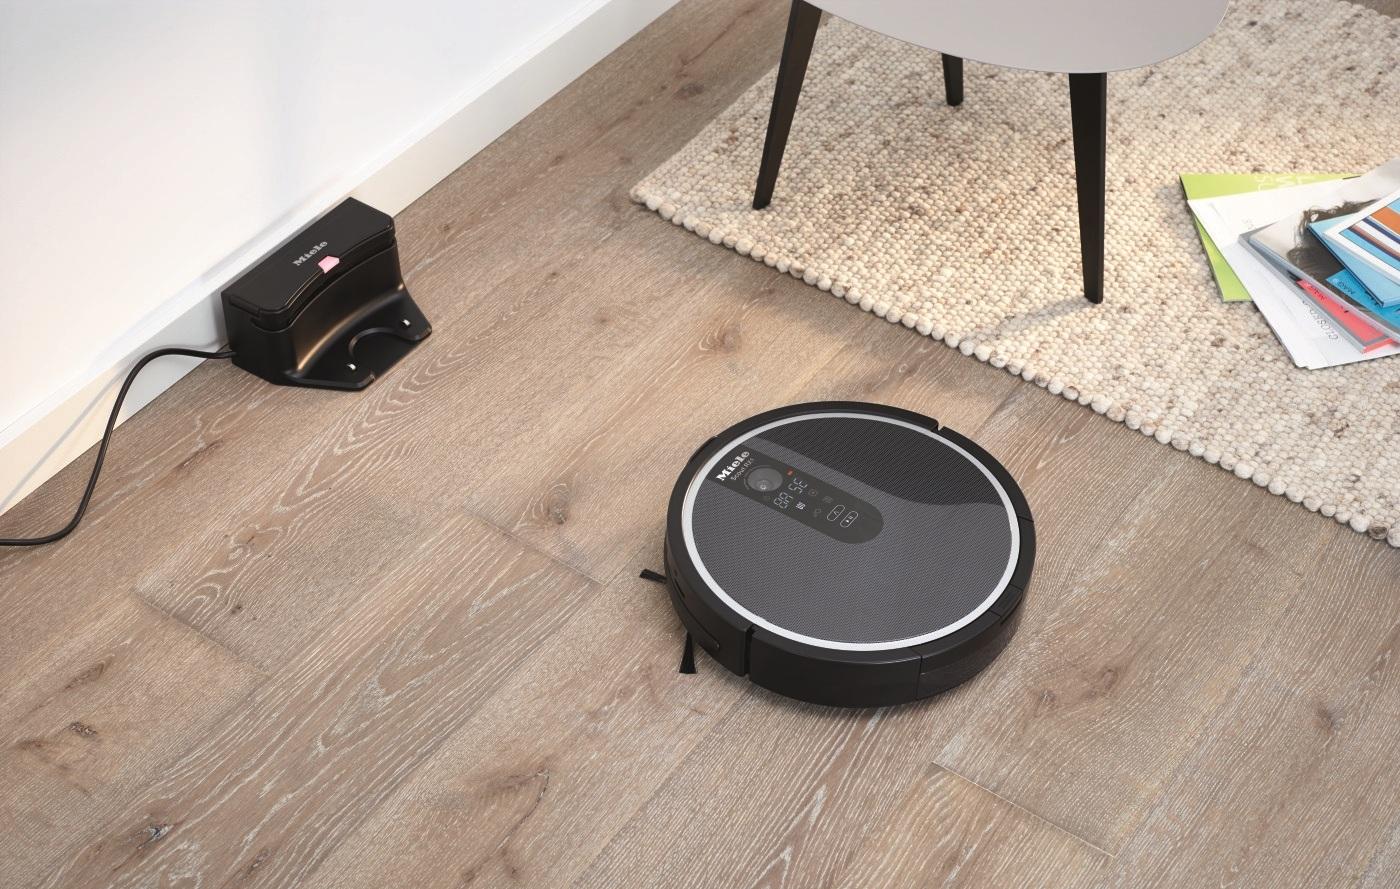 miele saugroboter scout rx1 vs elektro. Black Bedroom Furniture Sets. Home Design Ideas